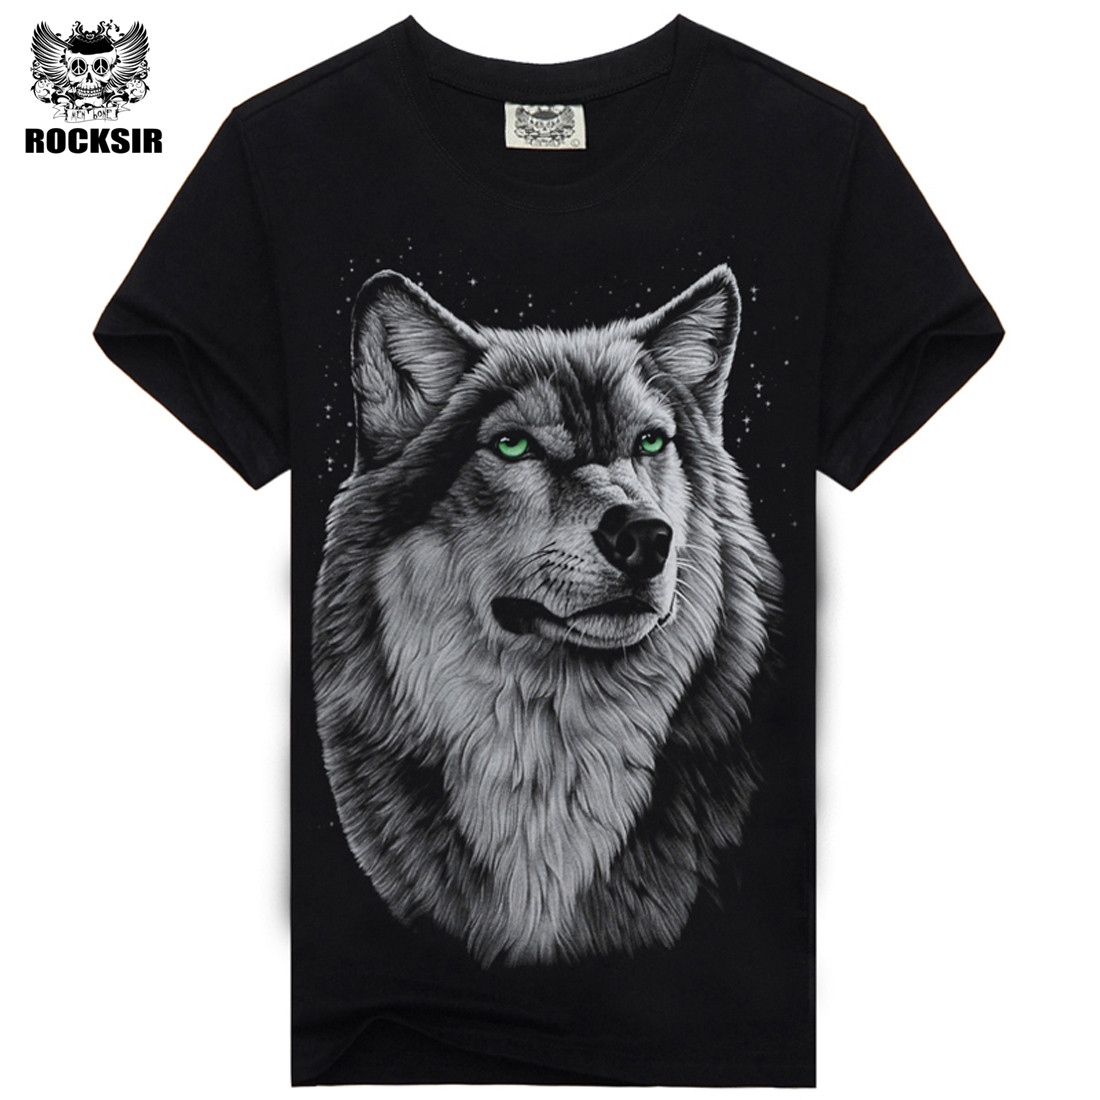 Rocksir 3d wolf t shirt mens Brand 3D Indians wolf Print t shirts Cotton wolves Men t-shirt Casual Man Tees Mens Tops 5